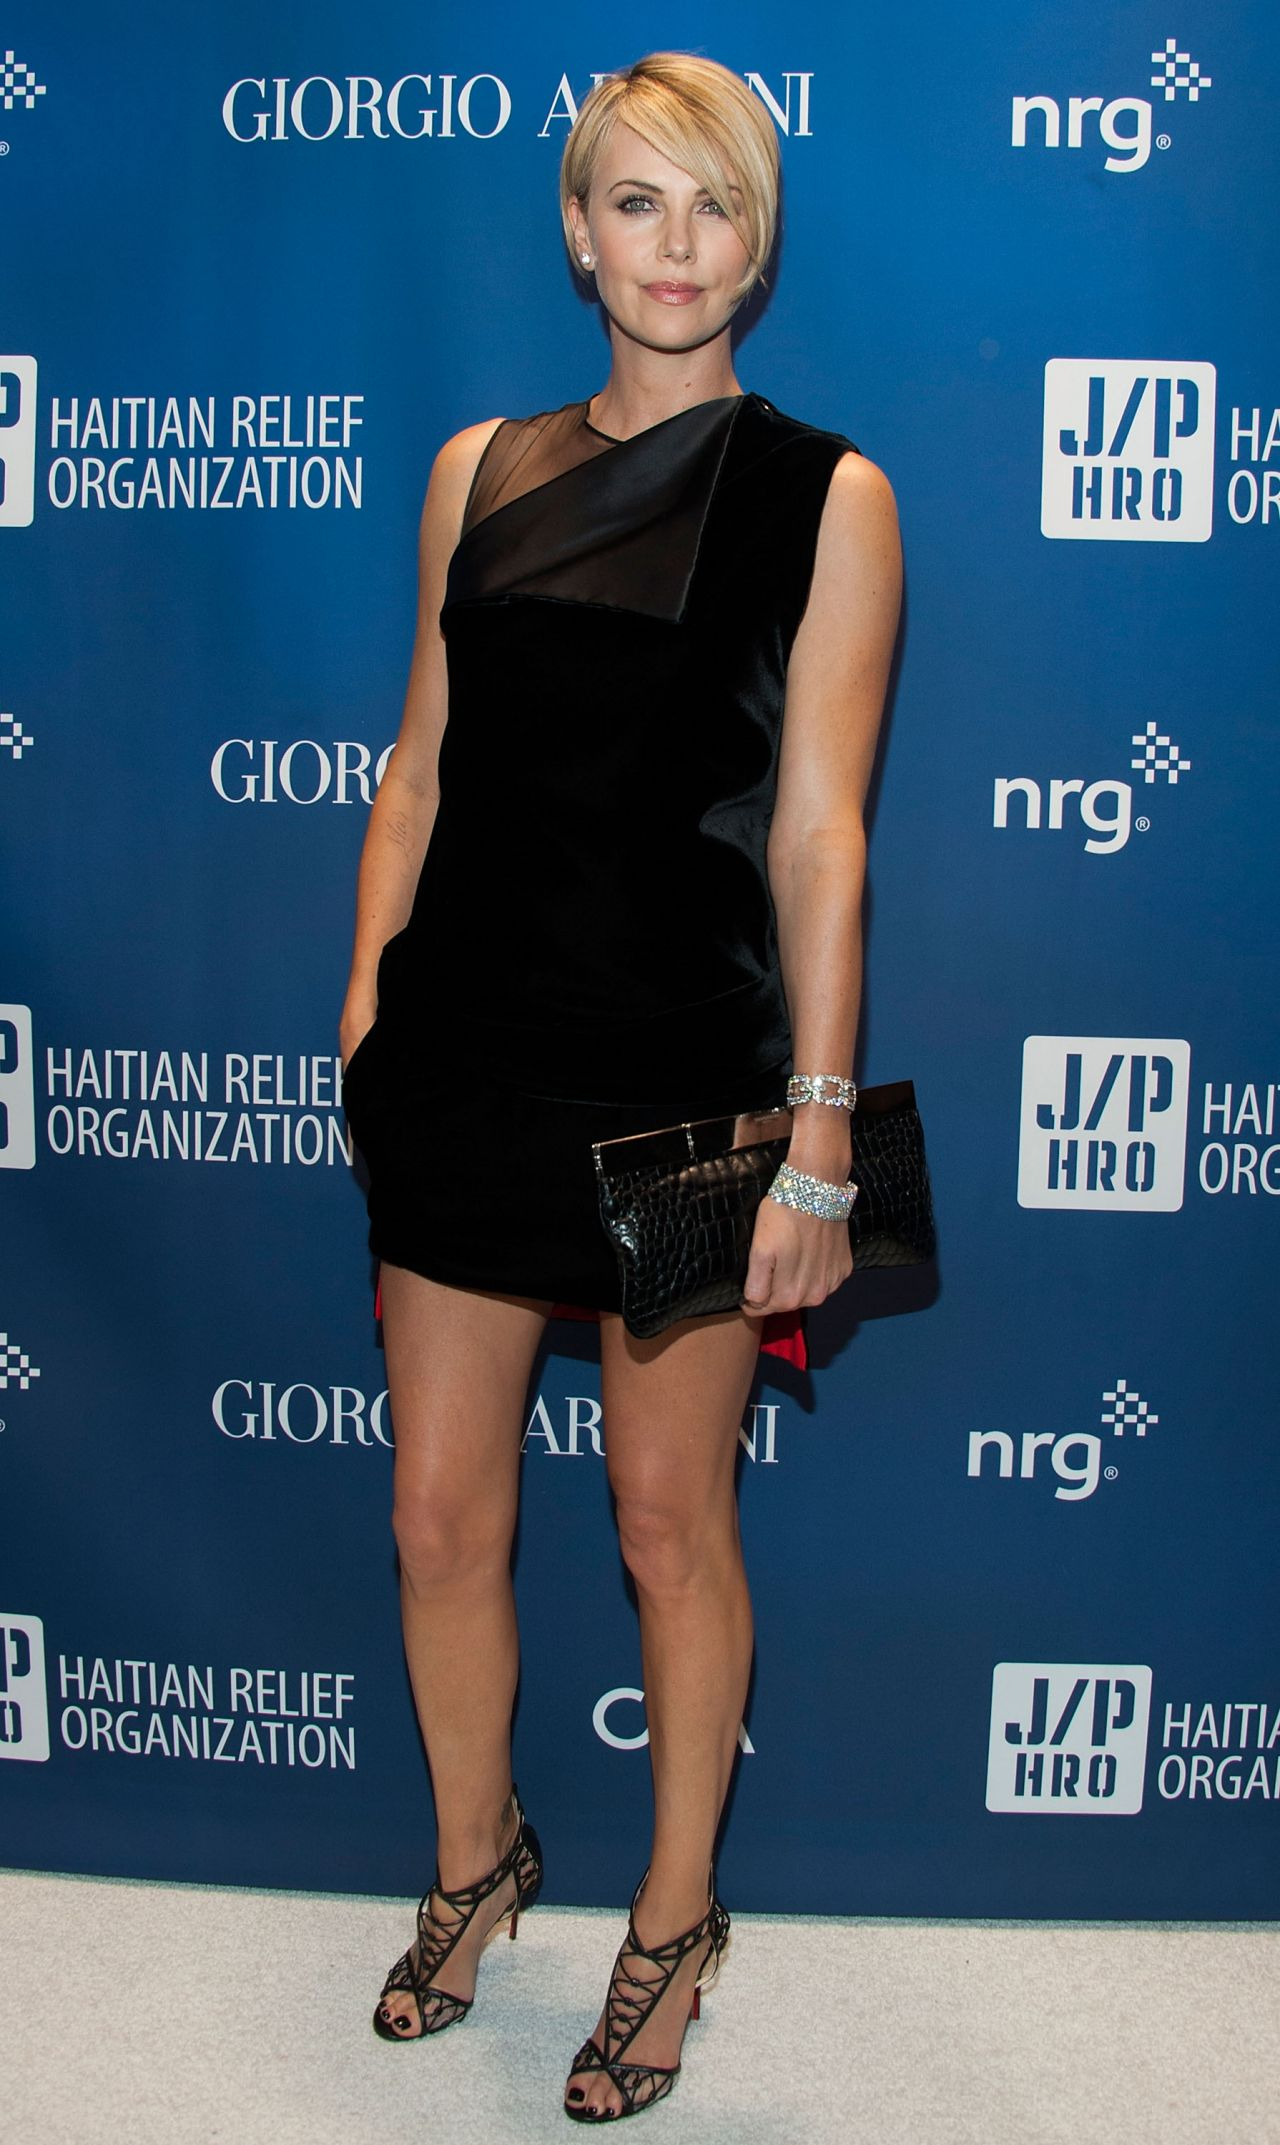 Charlize Theron Wearing Givenchy Dress at Sean Penn & Friends Help Haiti Home Gala, January 2014